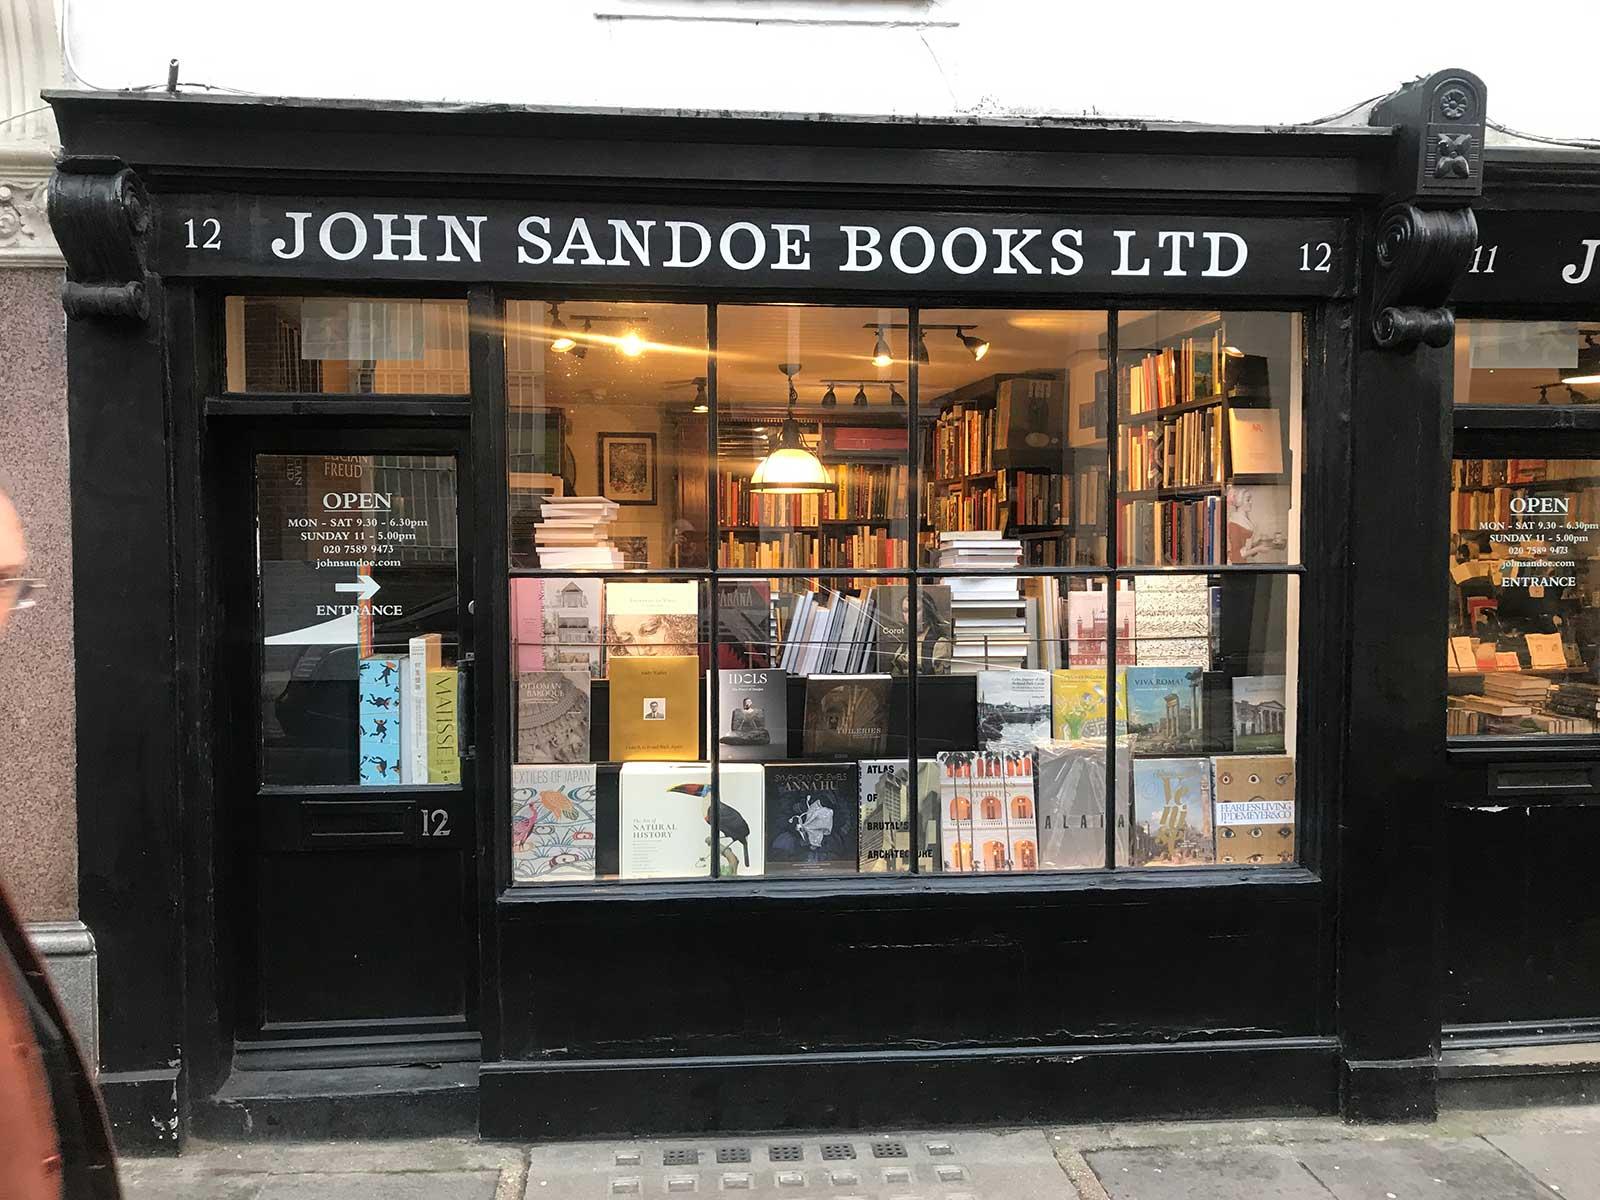 John Sandoe Books Ltd